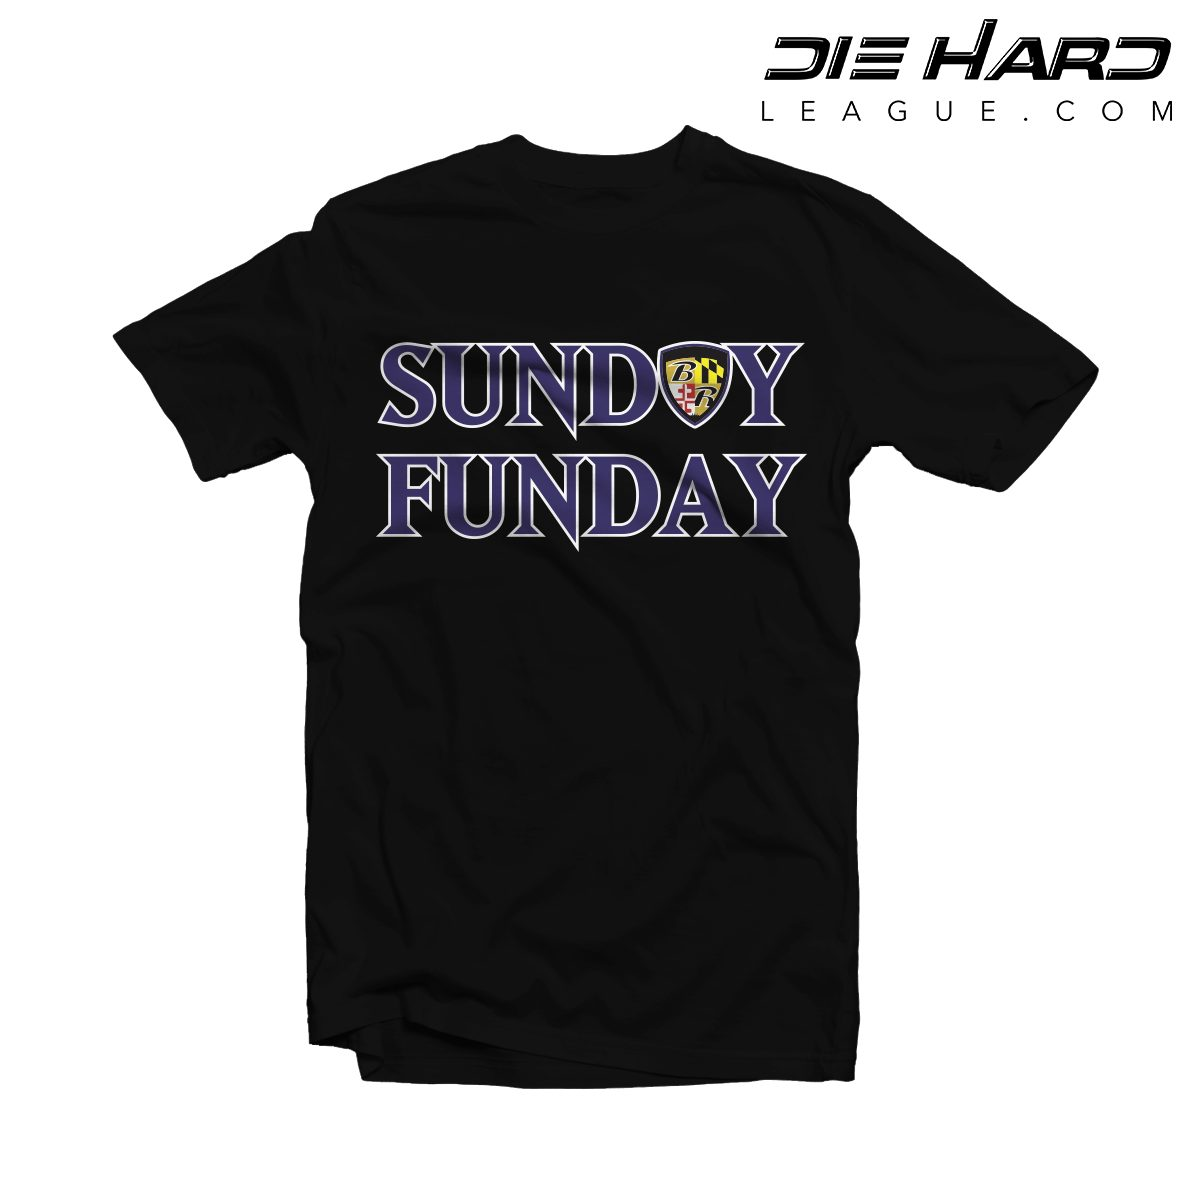 a9cc770332e00 Shop. Home/Baltimore Ravens/Ravens Shirts/Ravens Shirts Baltimore – Sunday  Funday Black Tee